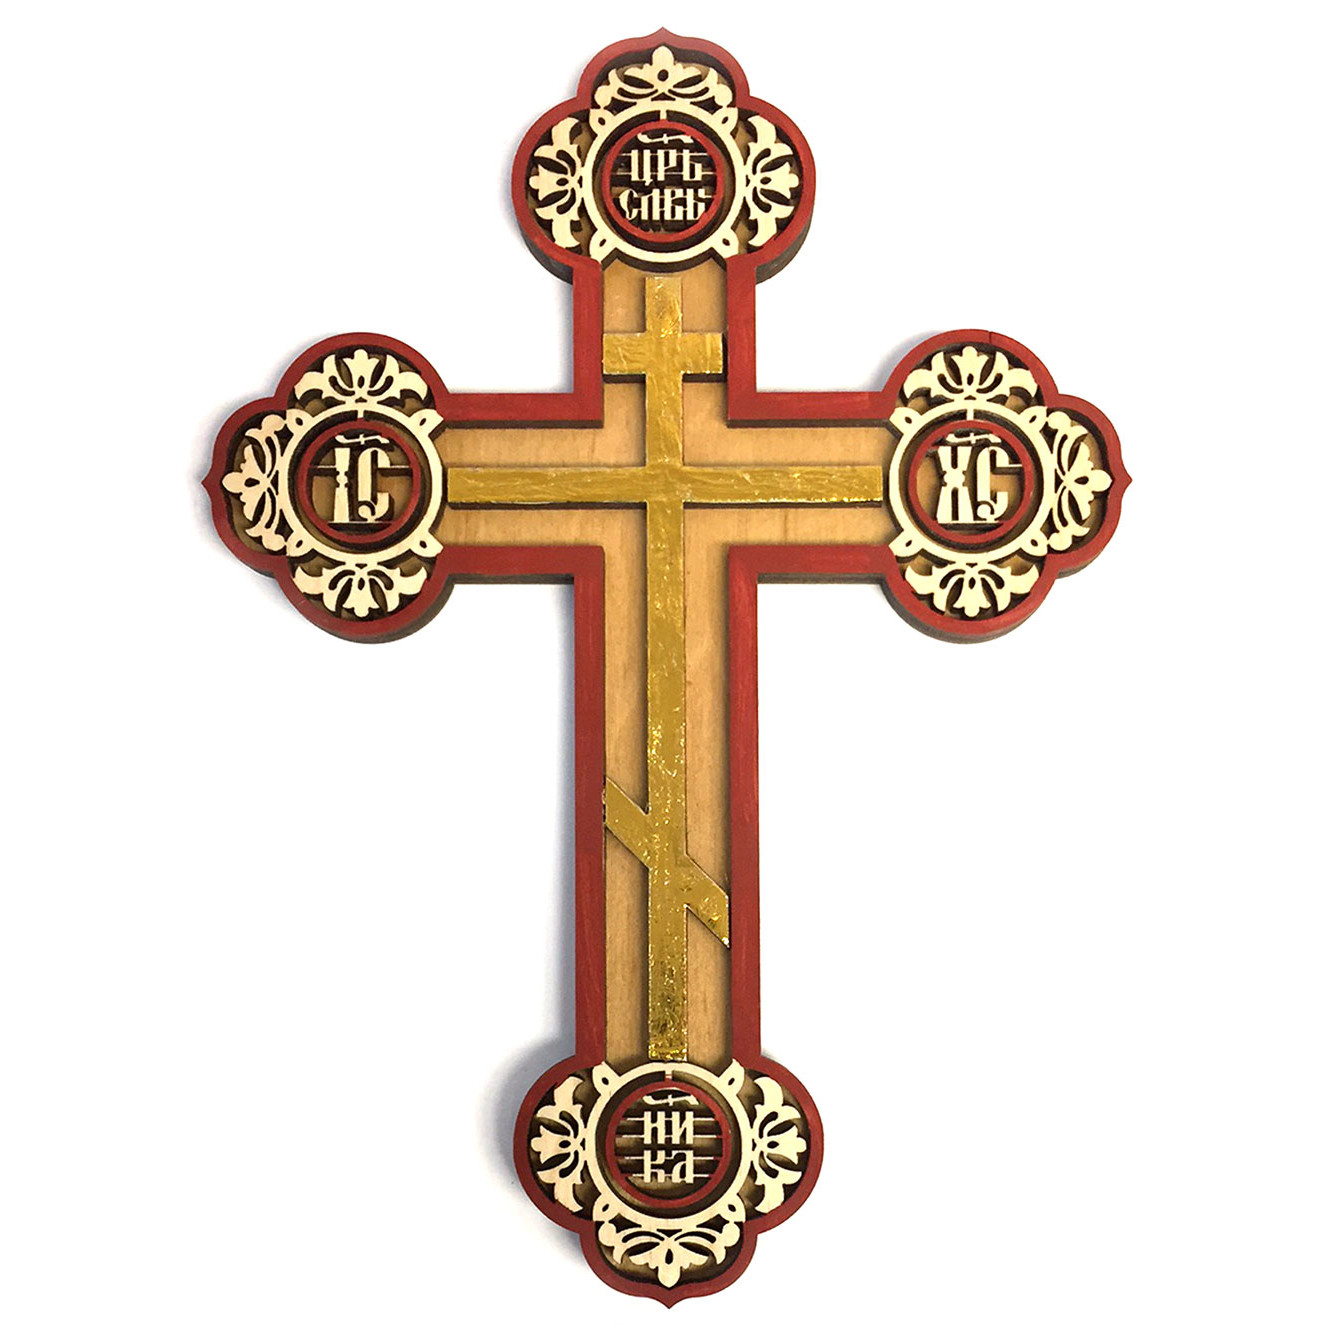 Wd 14 Pan Russian Orthodox Laser Cut Three Bar Cross Gold Inhanced 8